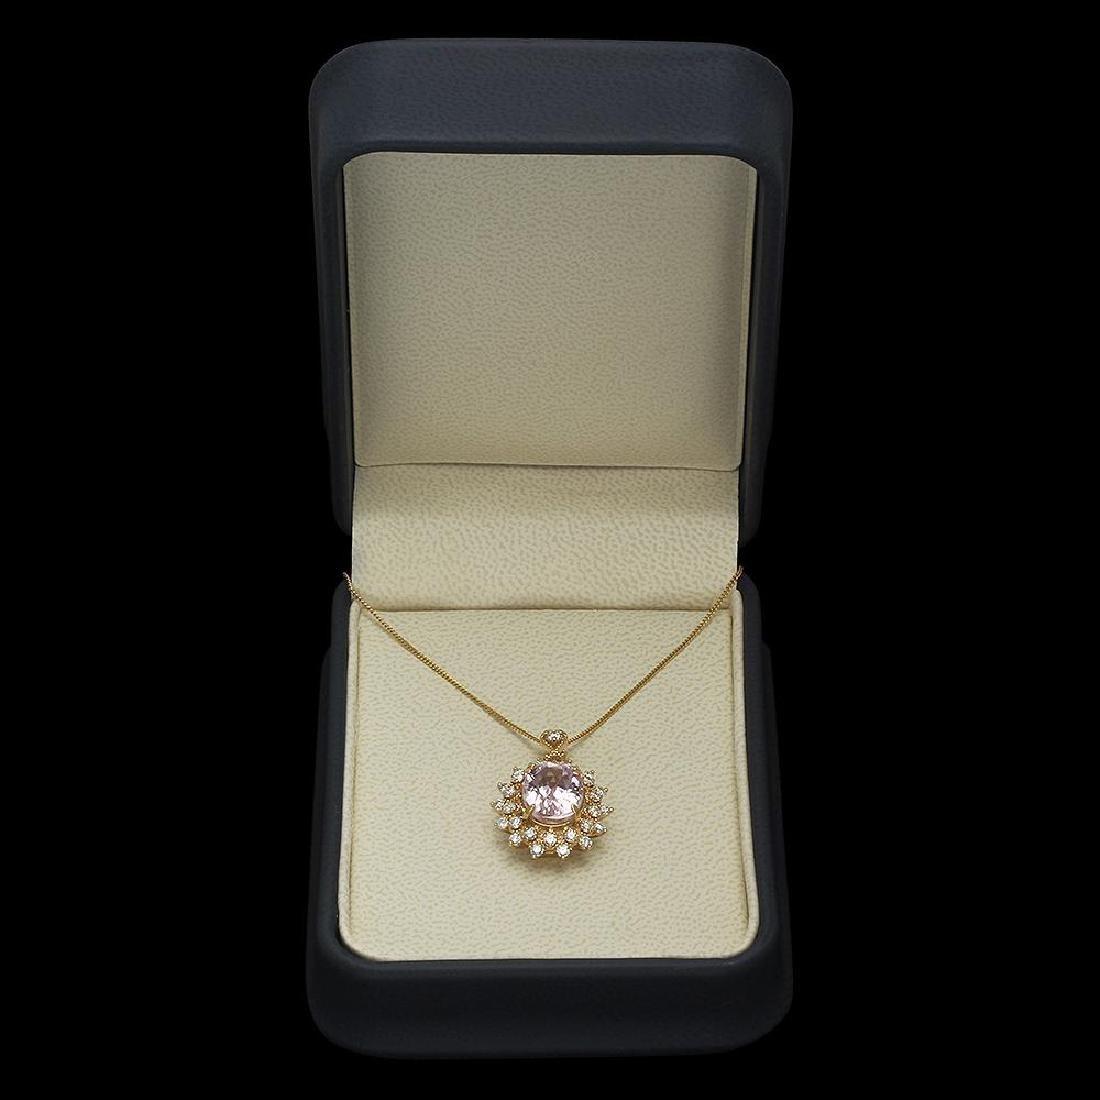 14K Gold 5.30ct Kunzite 1.00ct Diamond Pendant - 4